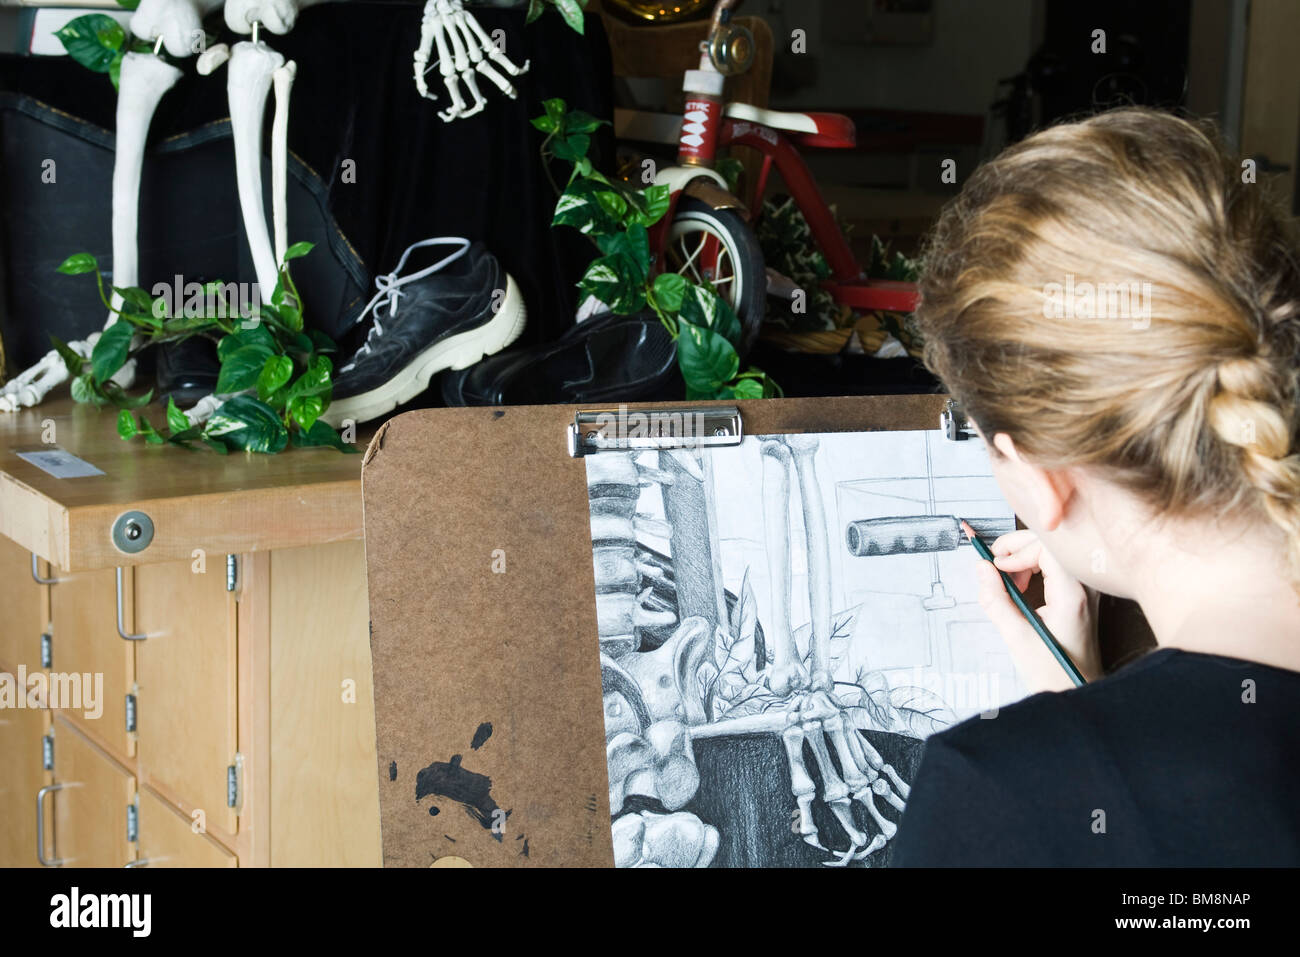 Artist drawing a still life scene - Stock Image